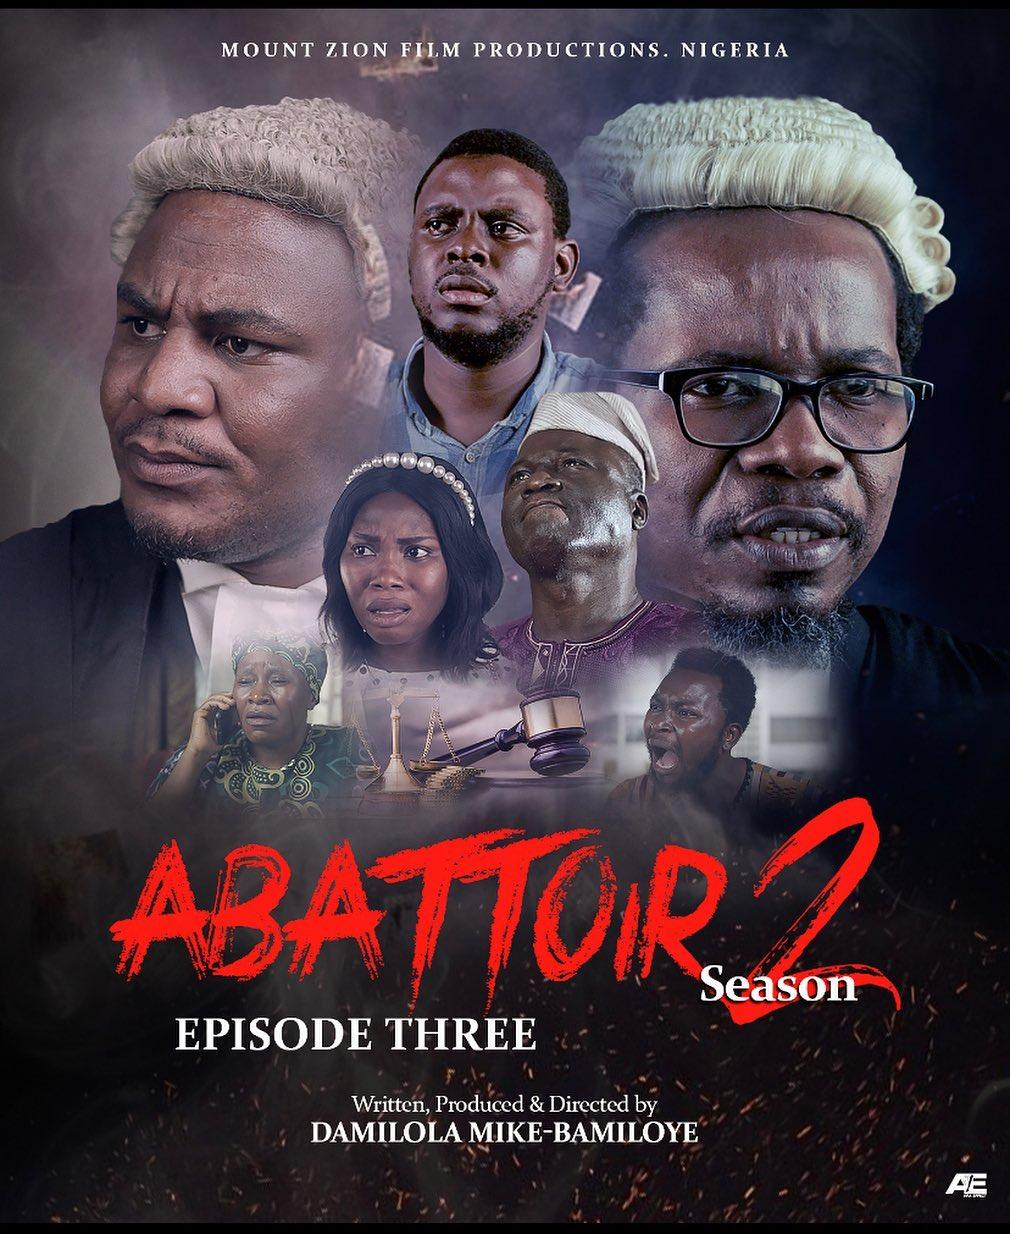 ABATTOIR S2 EP3